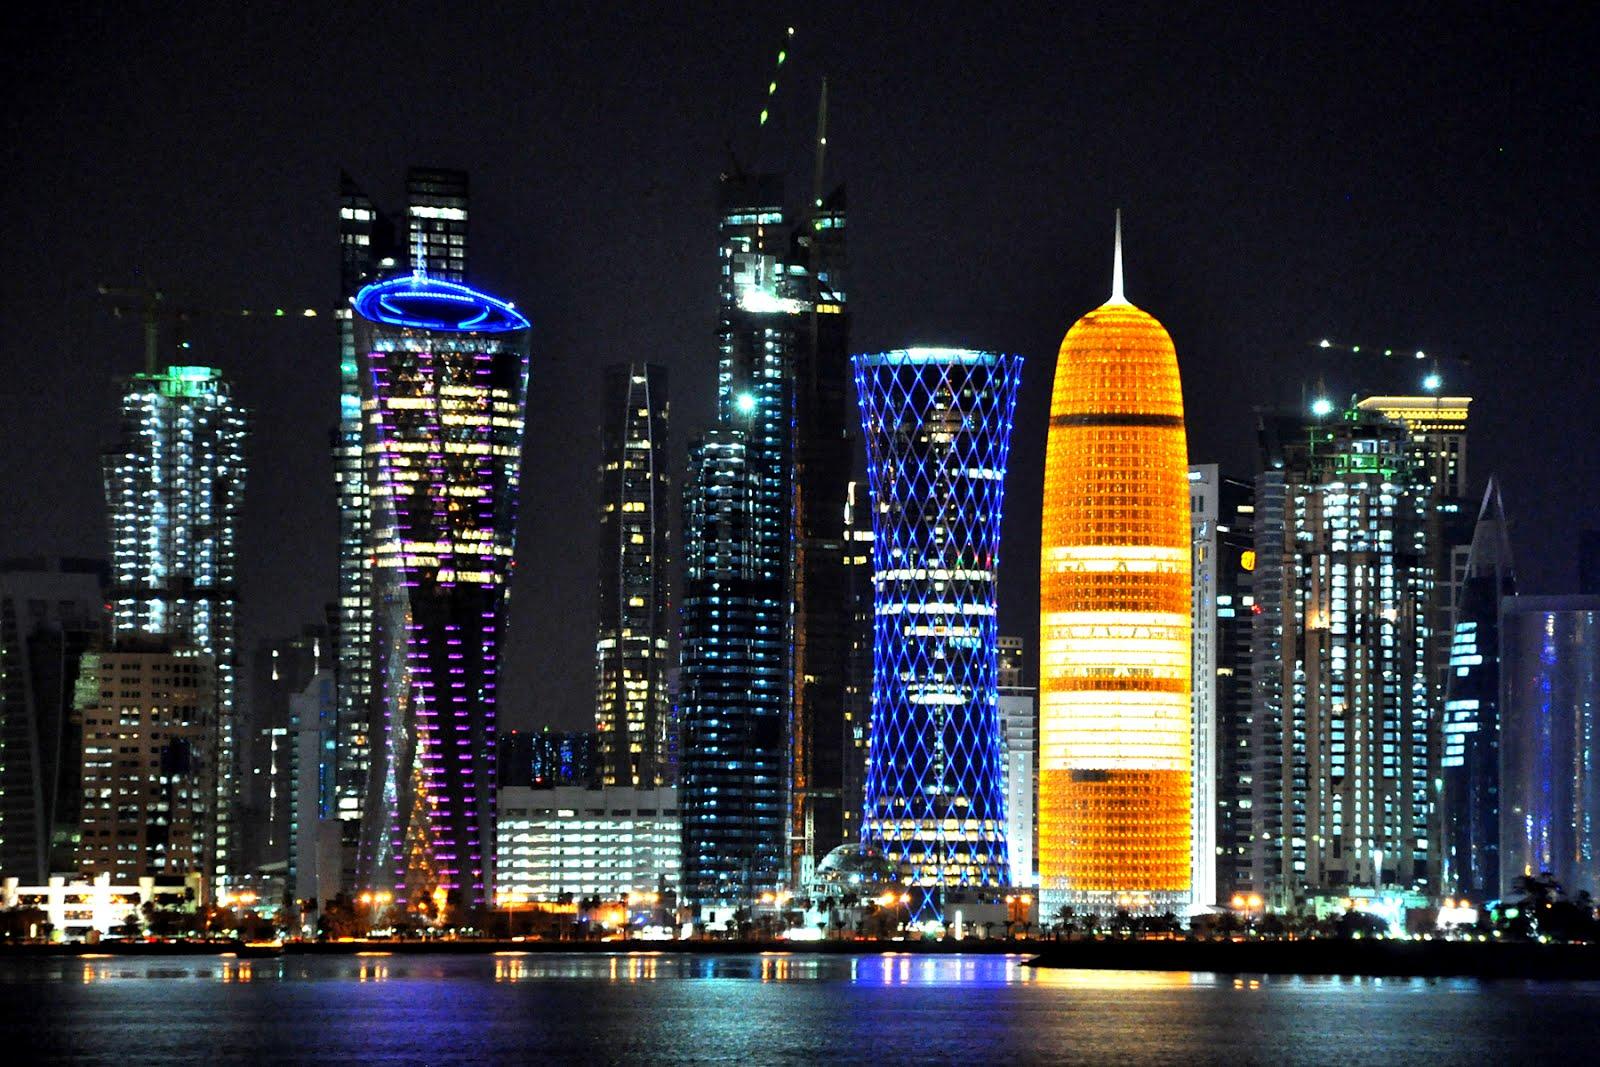 Skyline de Doha, capital de Qatar